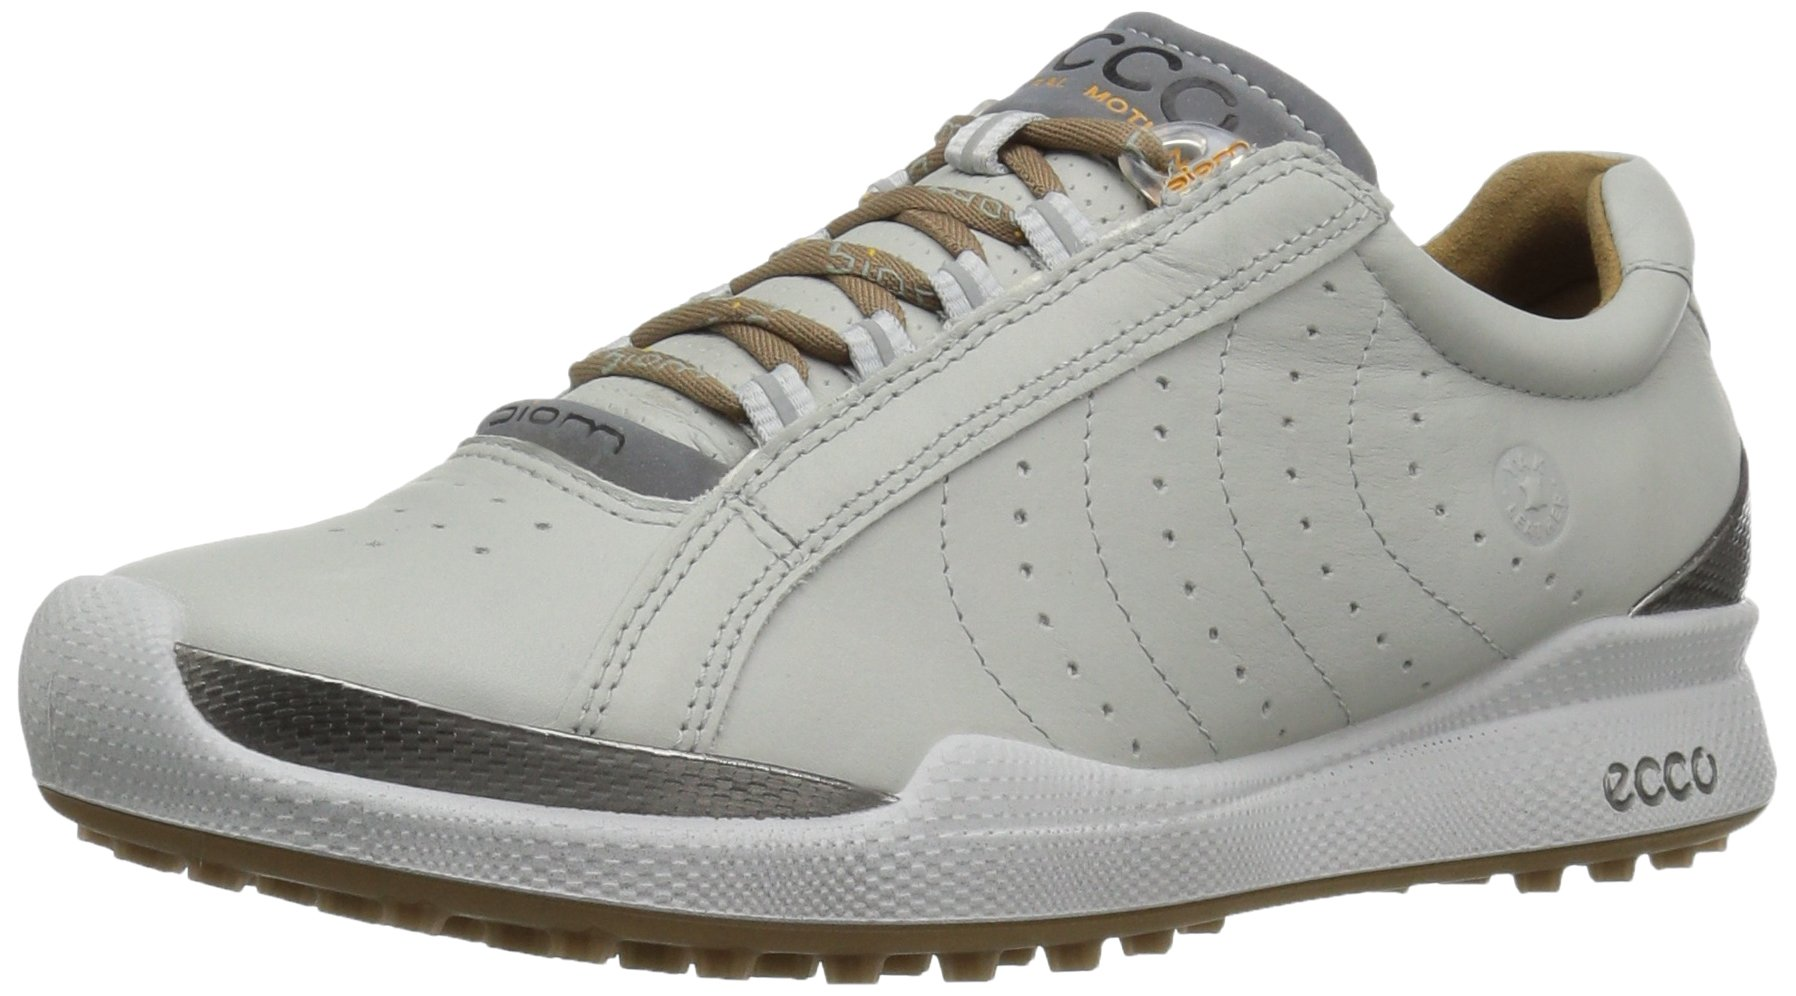 ECCO Women's Biom Hybrid Hydromax II Golf Shoe, Concrete/Mineral, 37 EU/6-6.5 M US